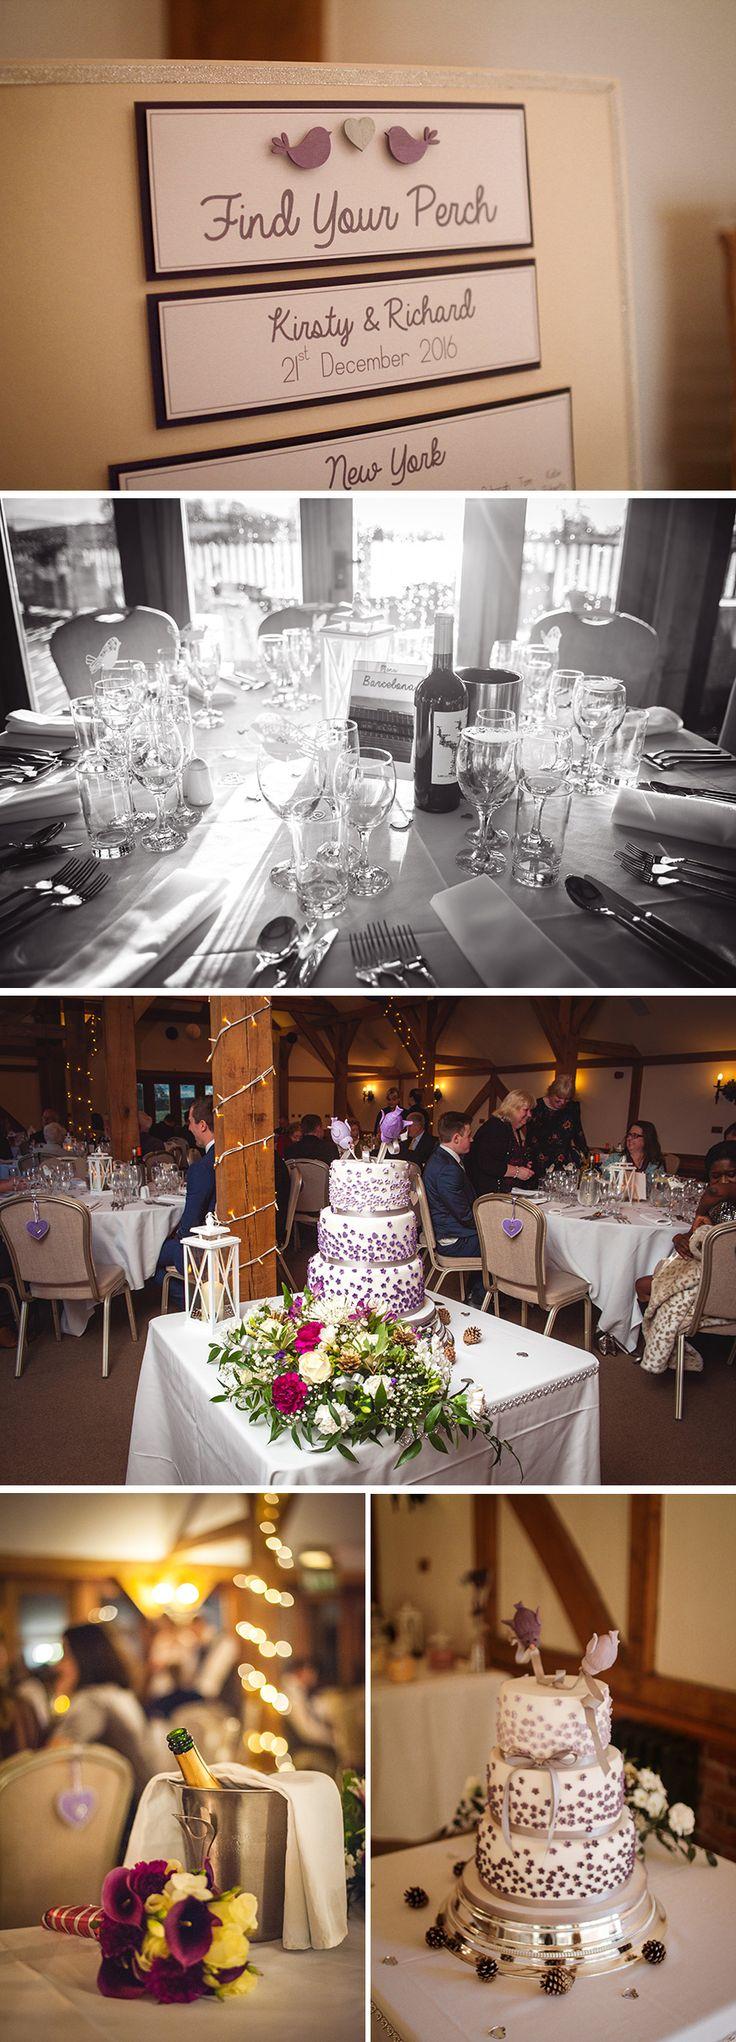 Kirsty And Richards Stunning Winter Wedding At Sandhole Oak Barn